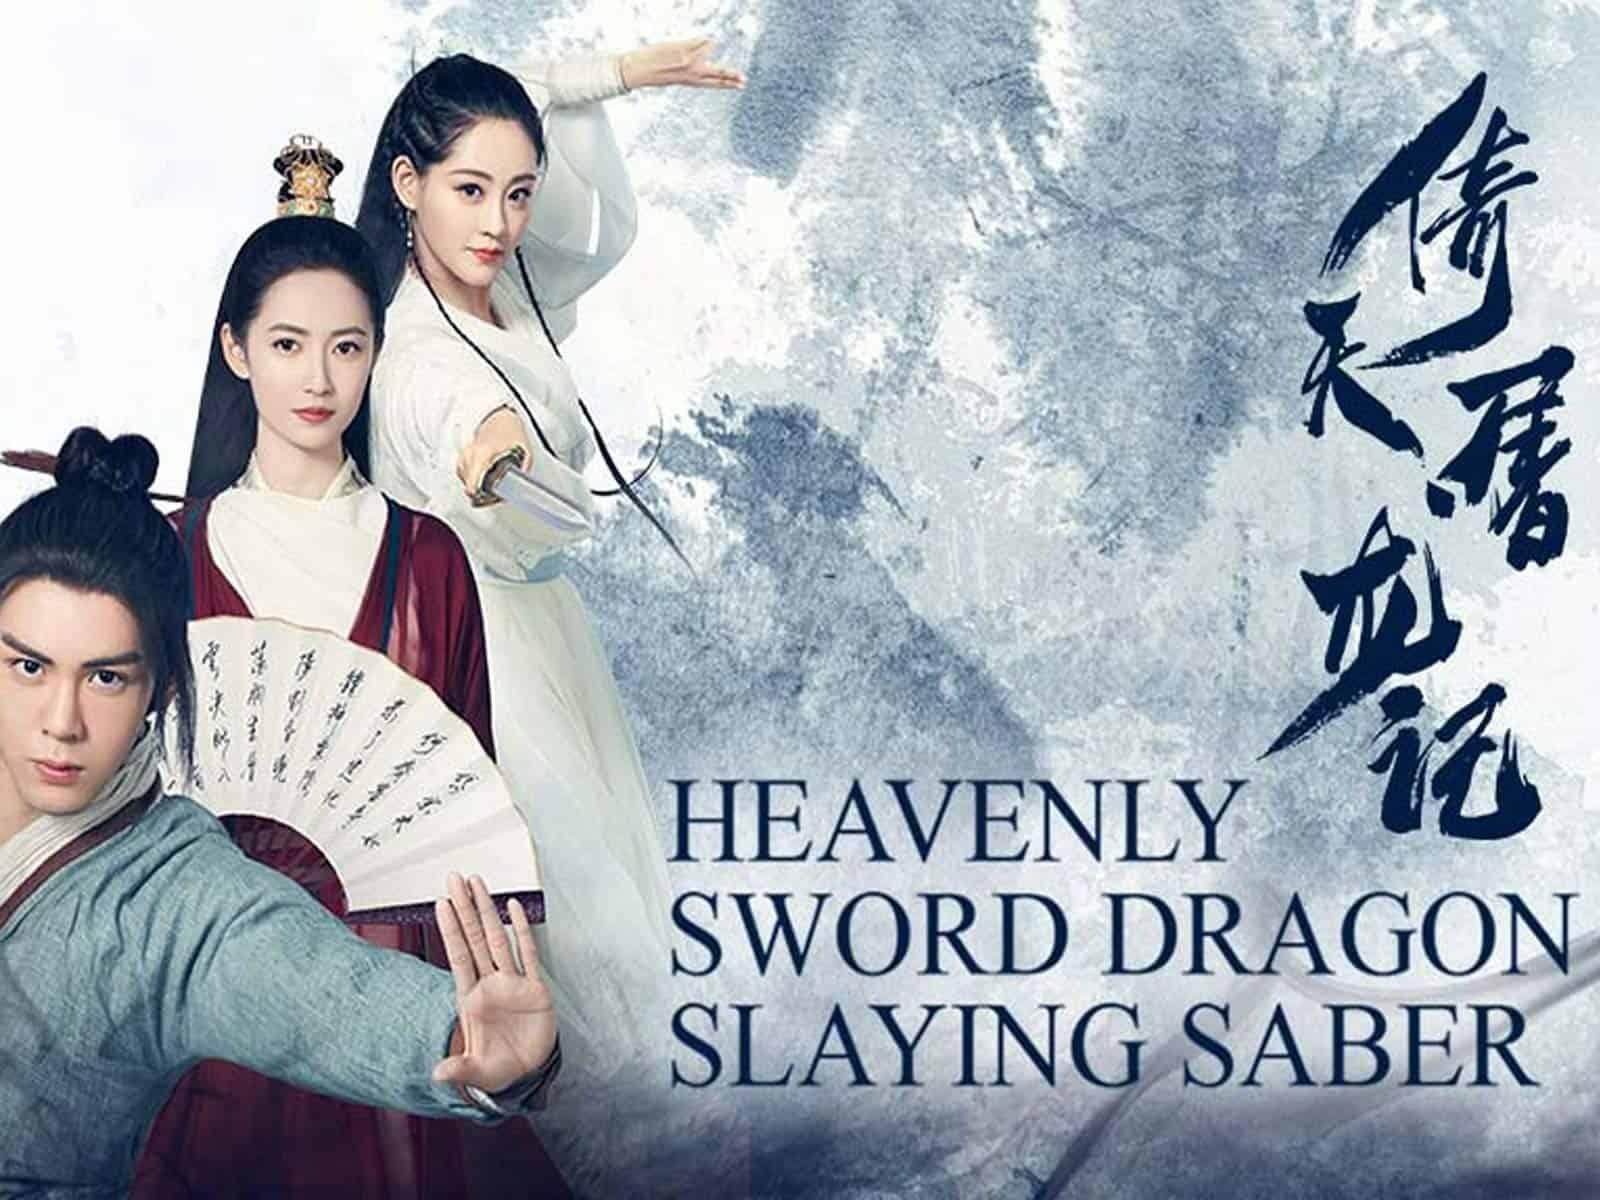 Heavenly Sword and Dragon Slaying Sabre 2019 ดาบมังกรหยก 2019 พากย์ไทย EP1 – EP33